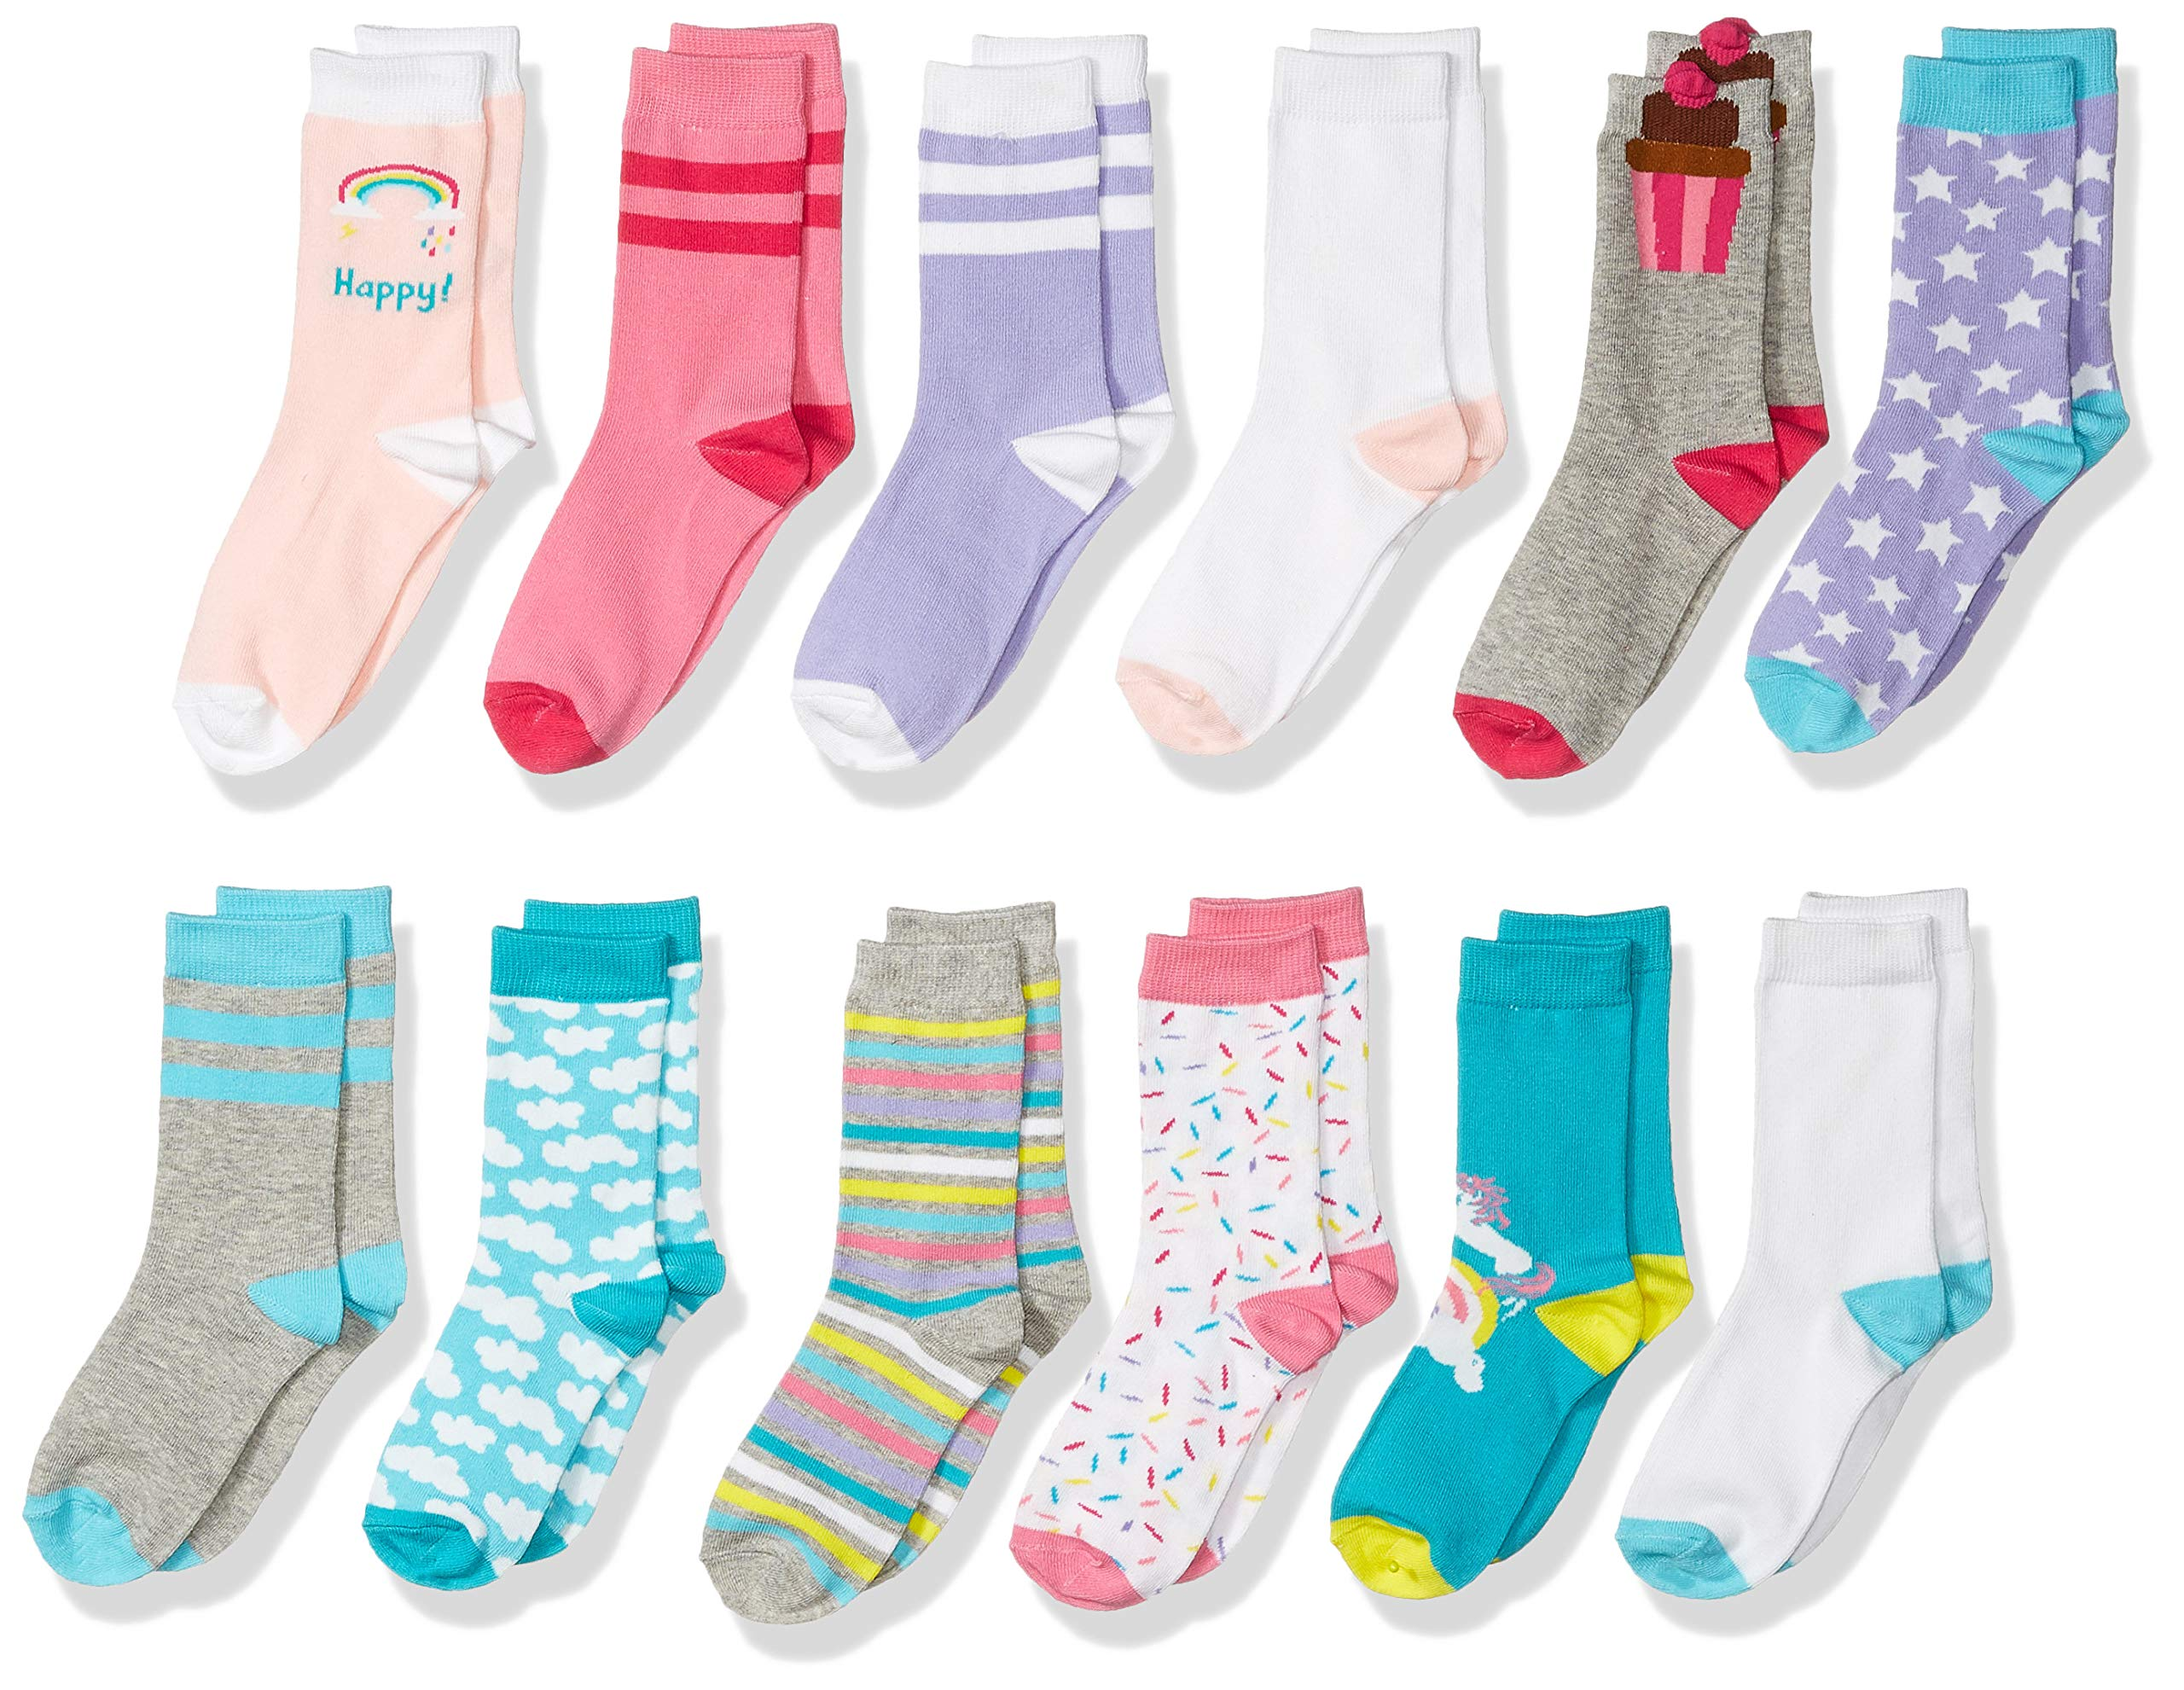 Spotted Zebra Kids' 12-Pack Crew Socks, Unicorn, Small (10-13) by Spotted Zebra (Image #1)